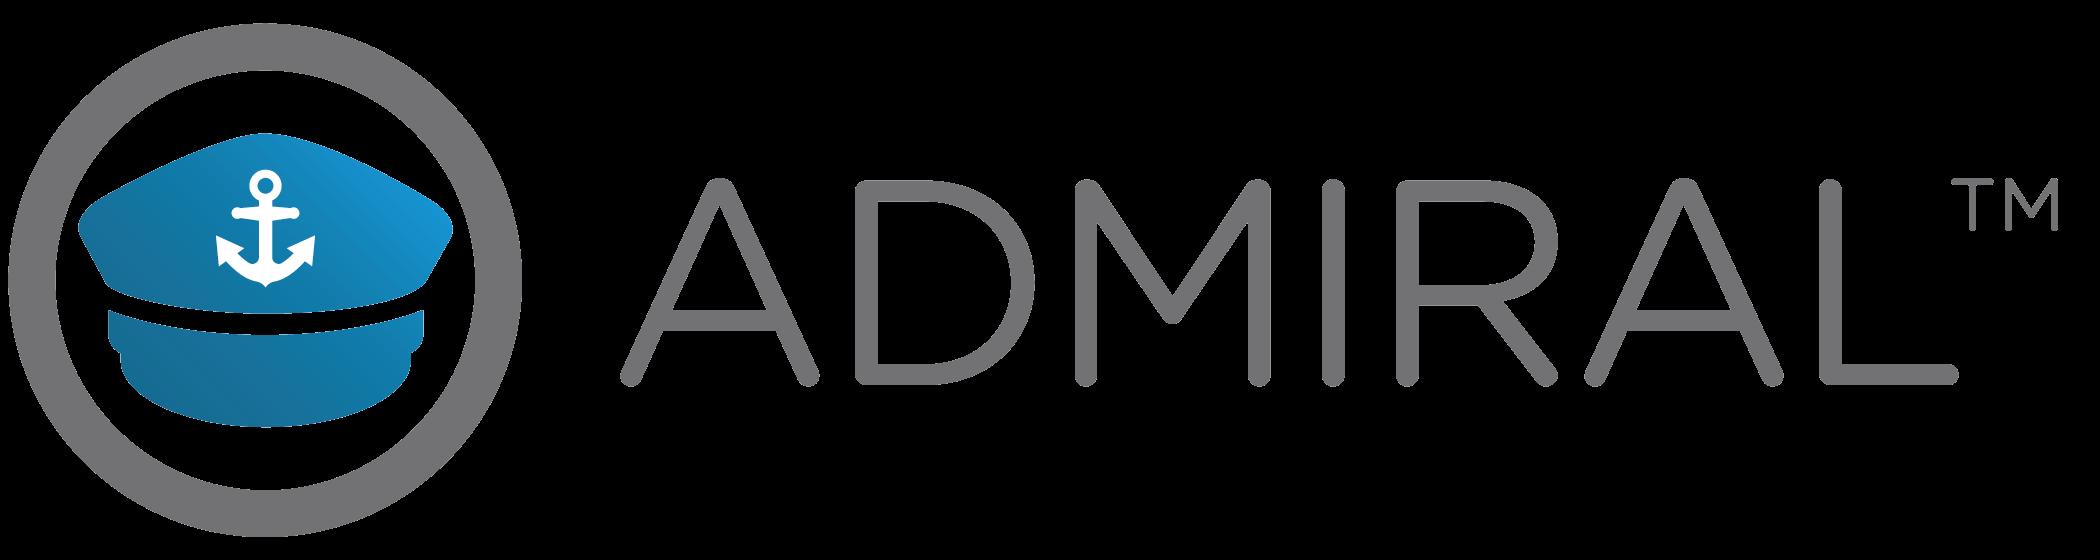 VMWare-Admiral-logo